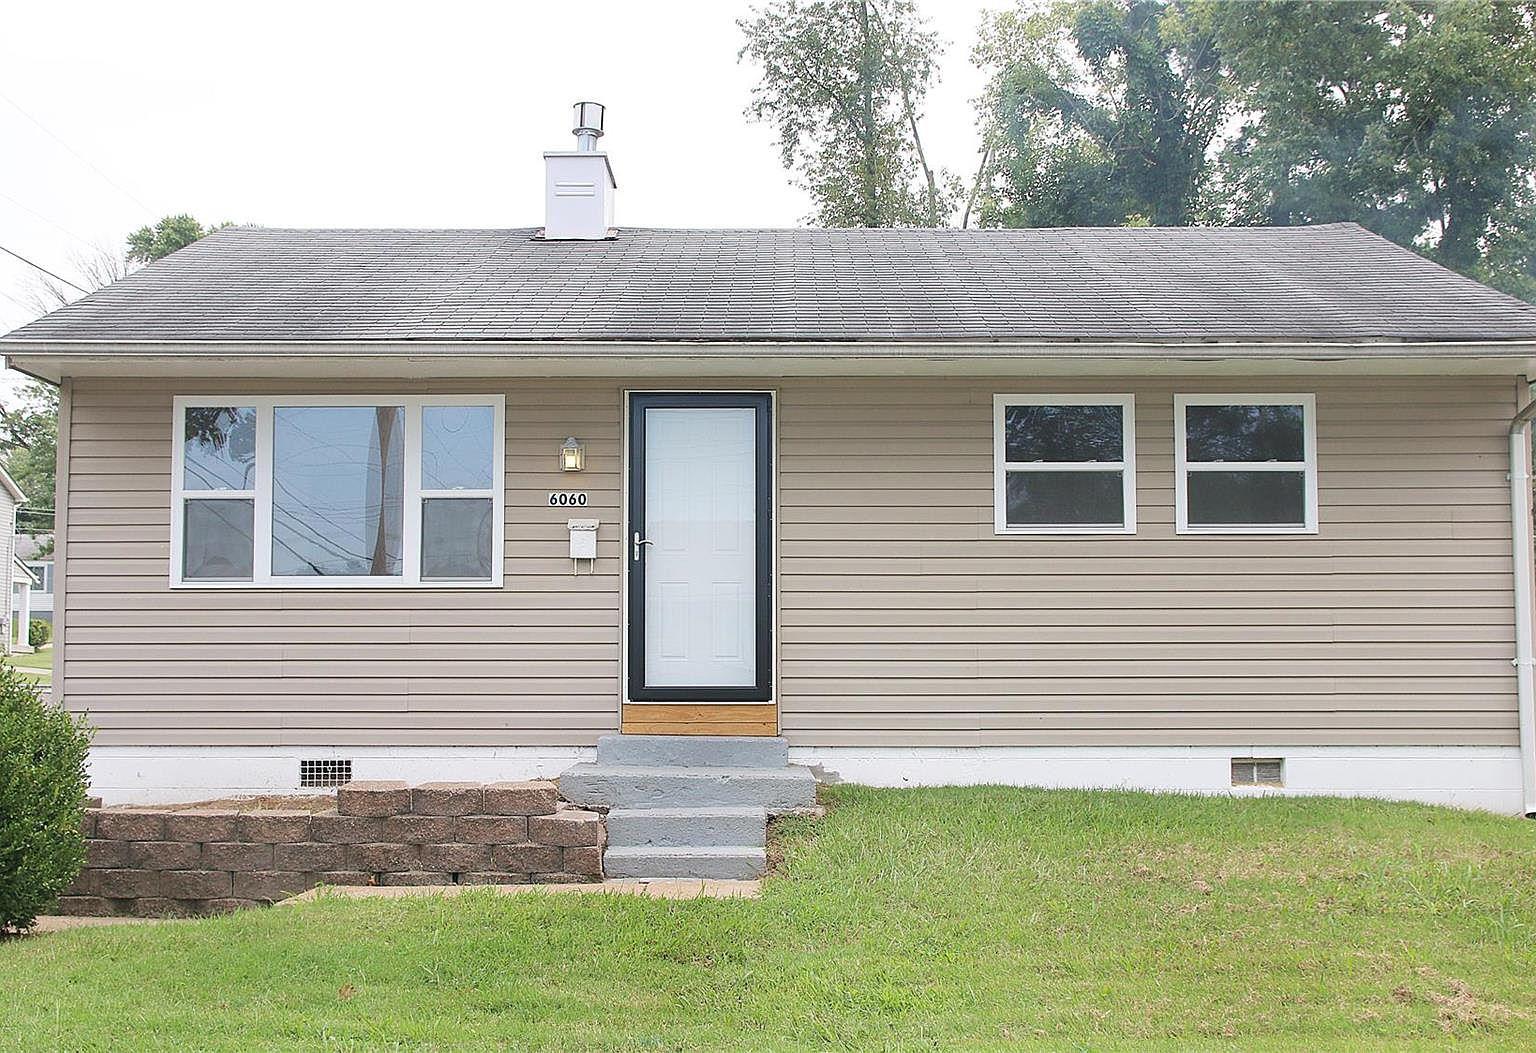 6060 Garfield Ave Saint Louis Mo 63134 Mls 20065562 Zillow